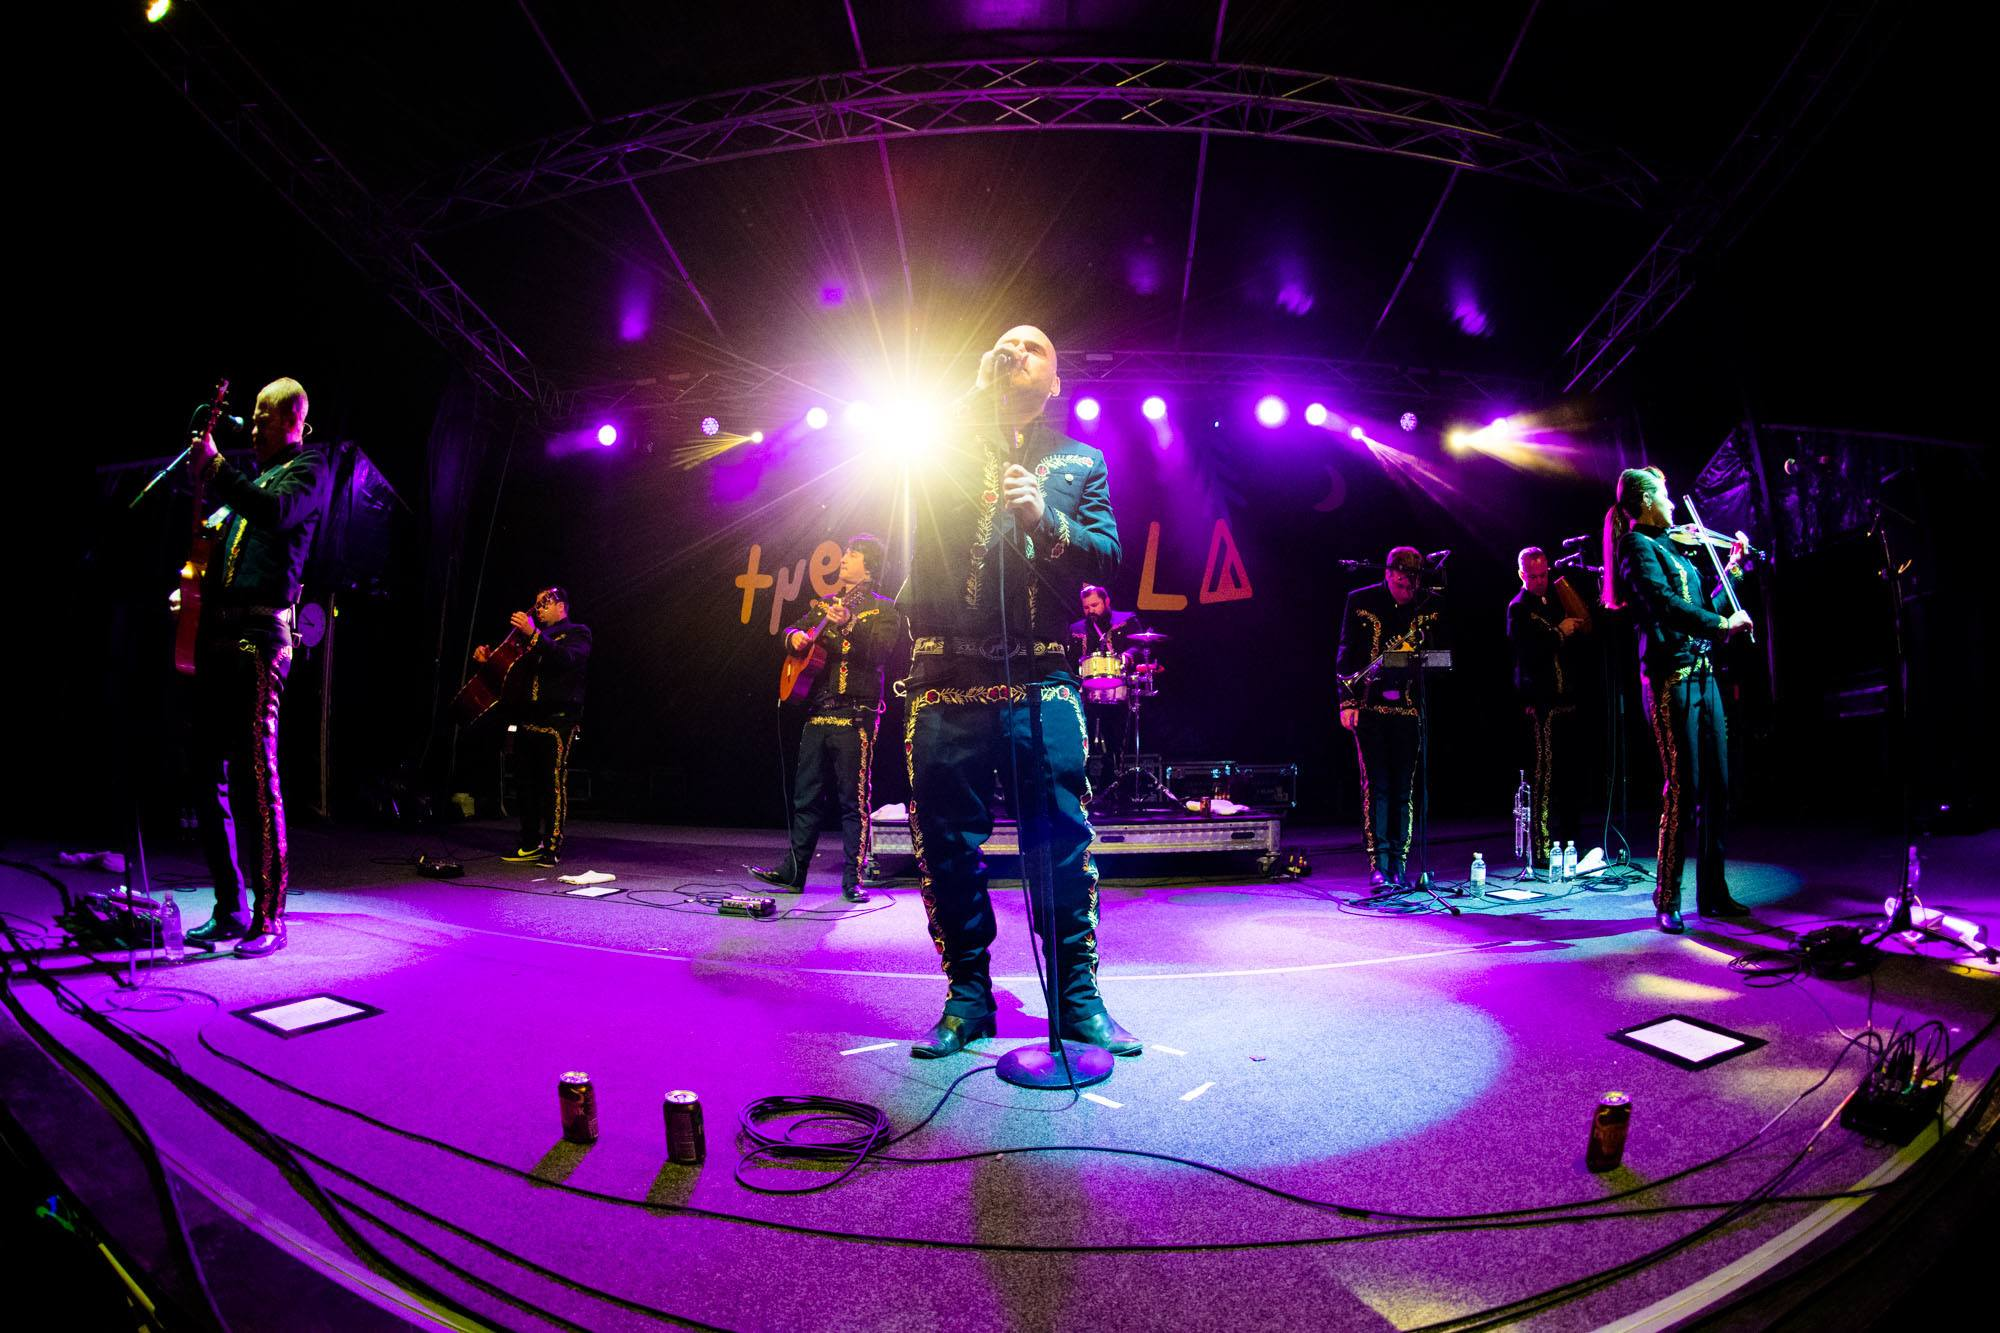 Mariachi El Bronx performing at The Lost Lands 2016